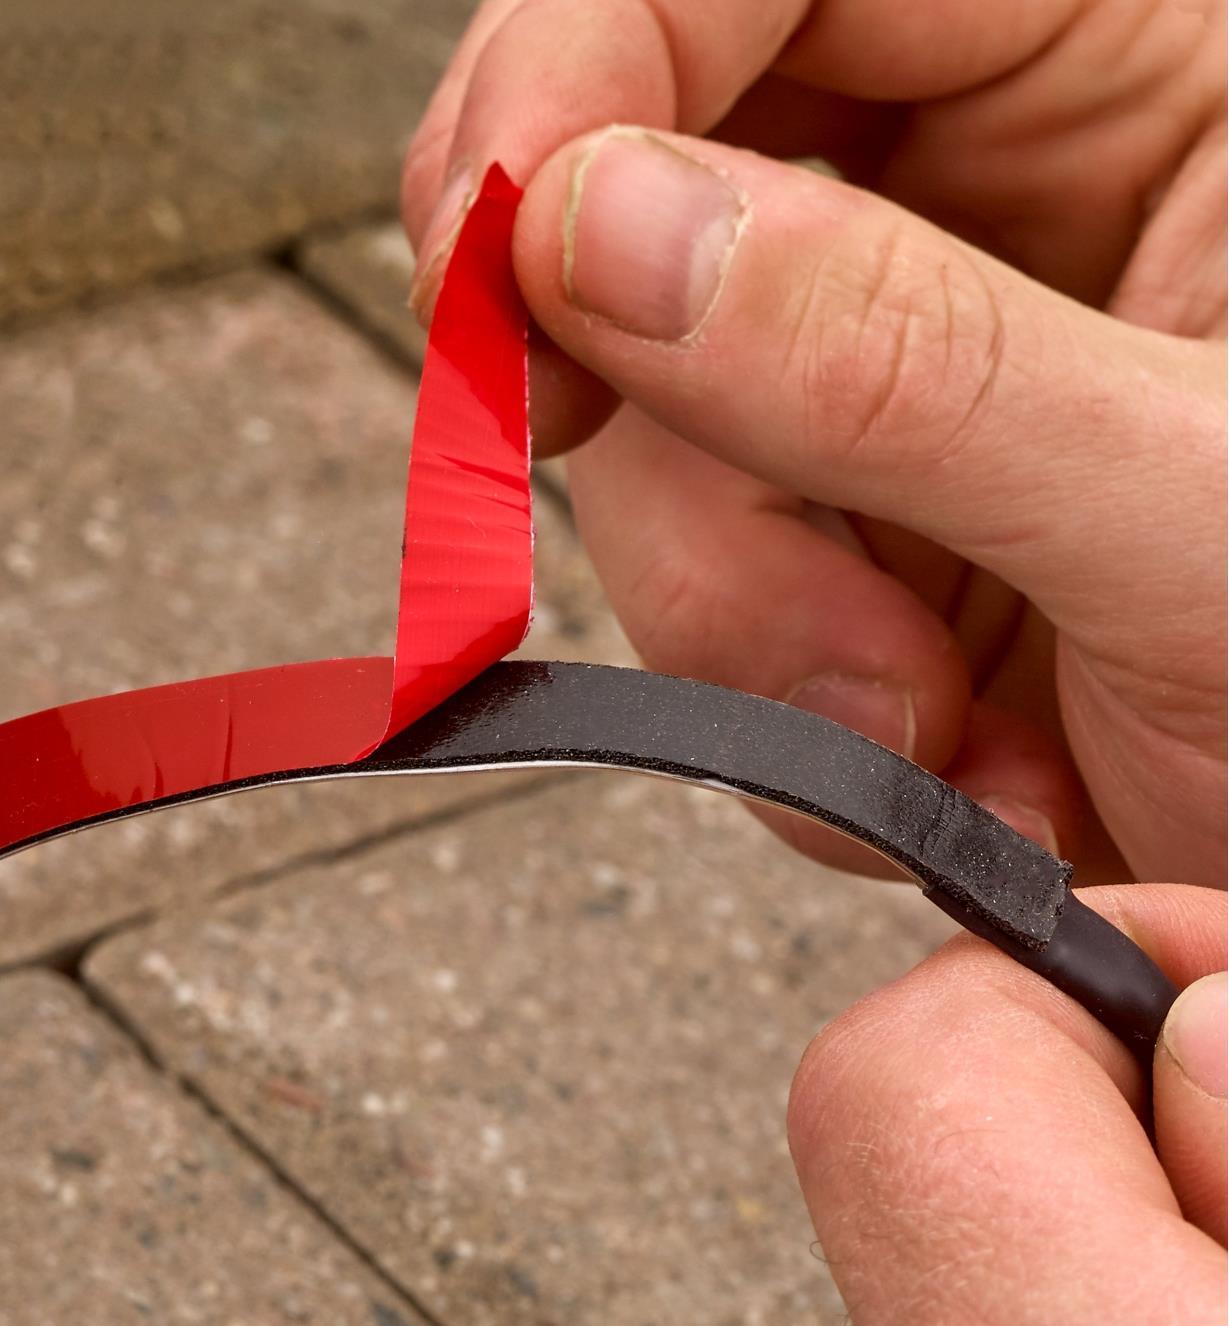 Peeling the LED tape lighting's adhesive backing before mounting it